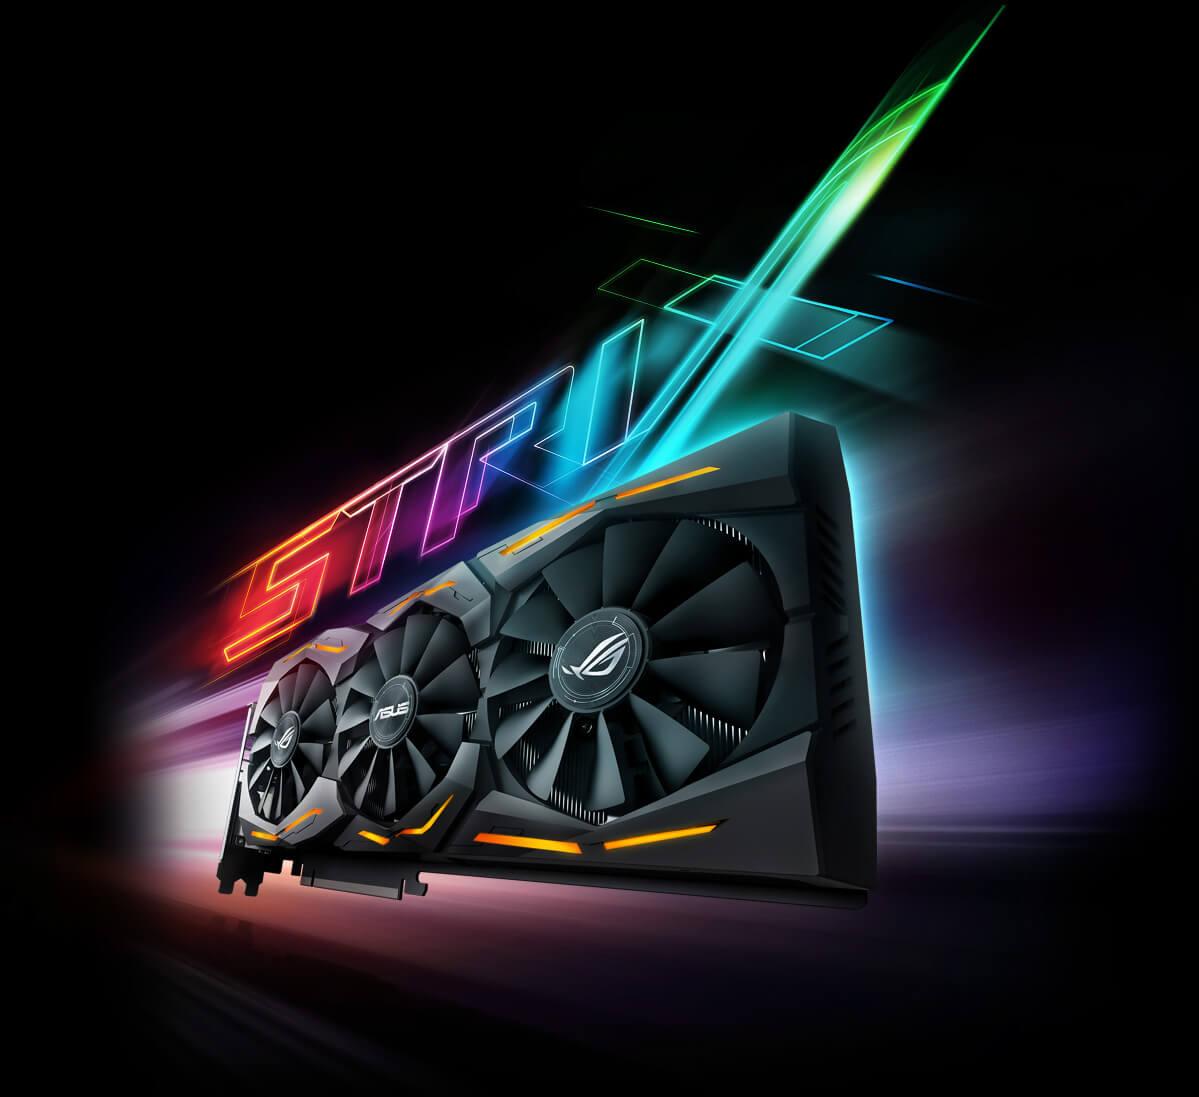 wieder da [Mindfactory] 8GB Asus GeForce GTX 1080 Strix Advanced + Xbox 360 Microsoft Wireless Controller + Destiny 2 + Assassins Creed Origins